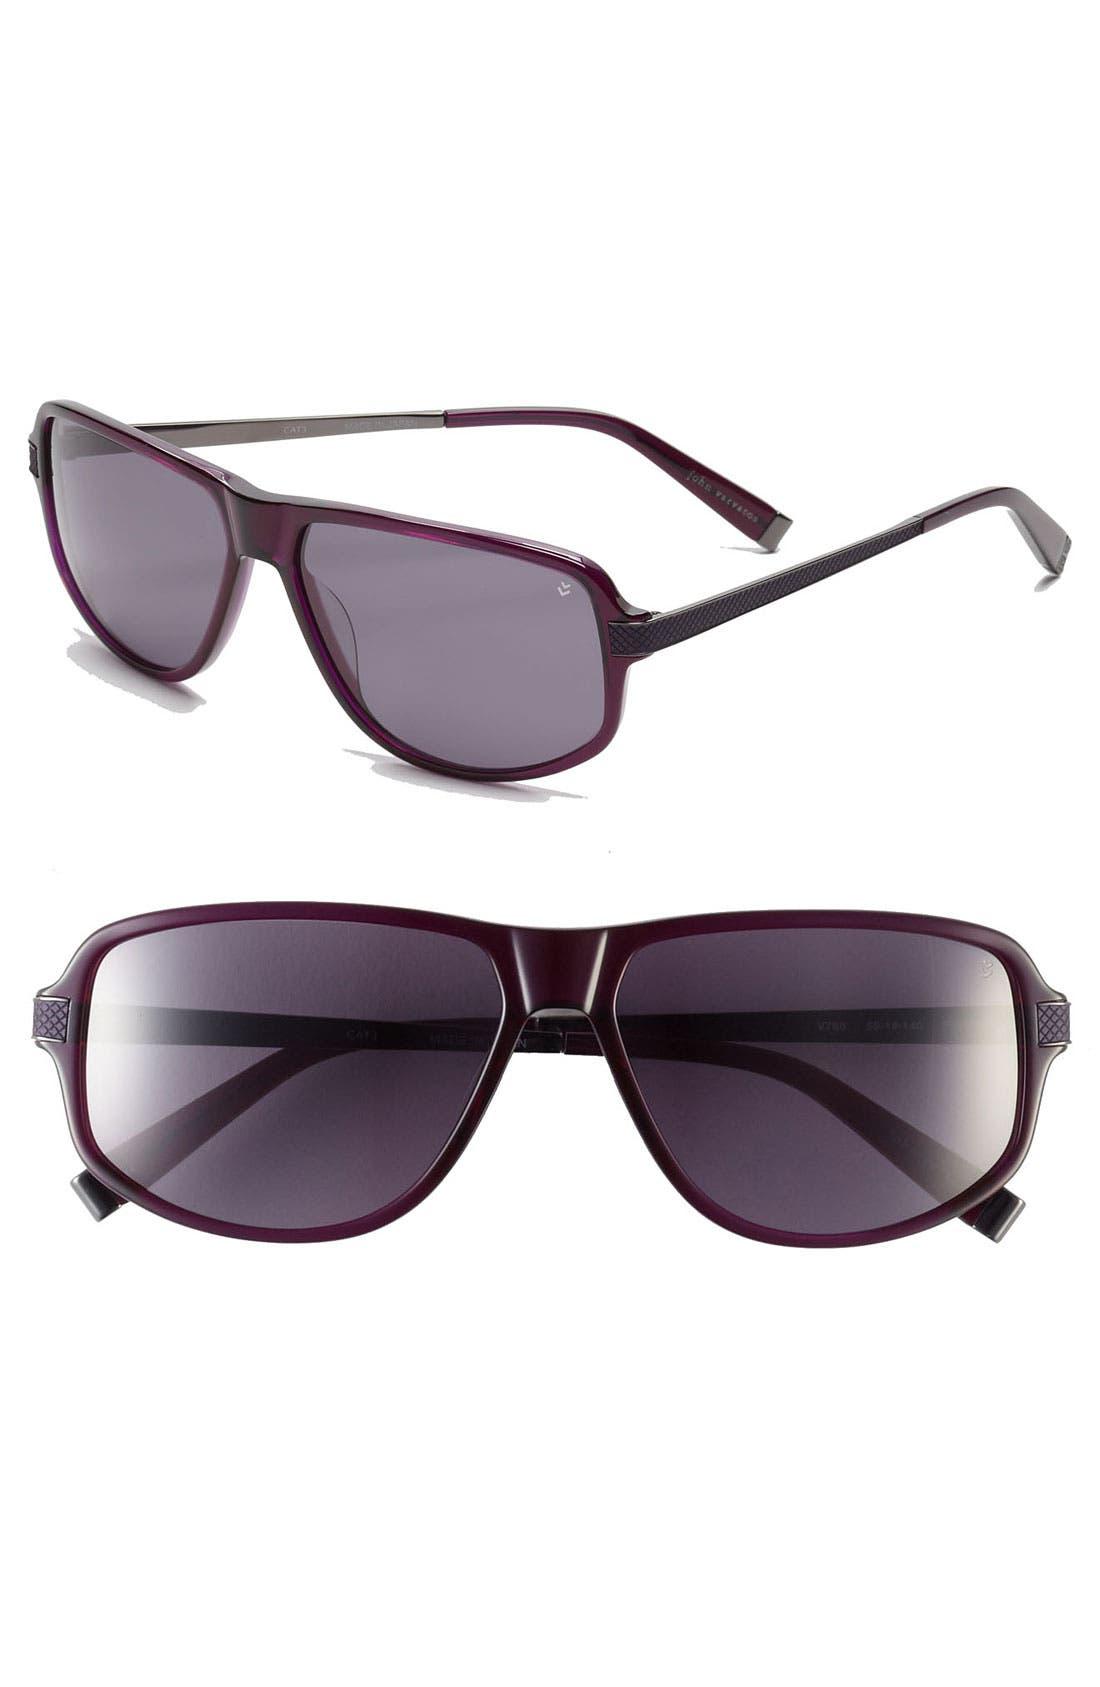 Alternate Image 1 Selected - John Varvatos Collection 'V780' 59mm Sunglasses